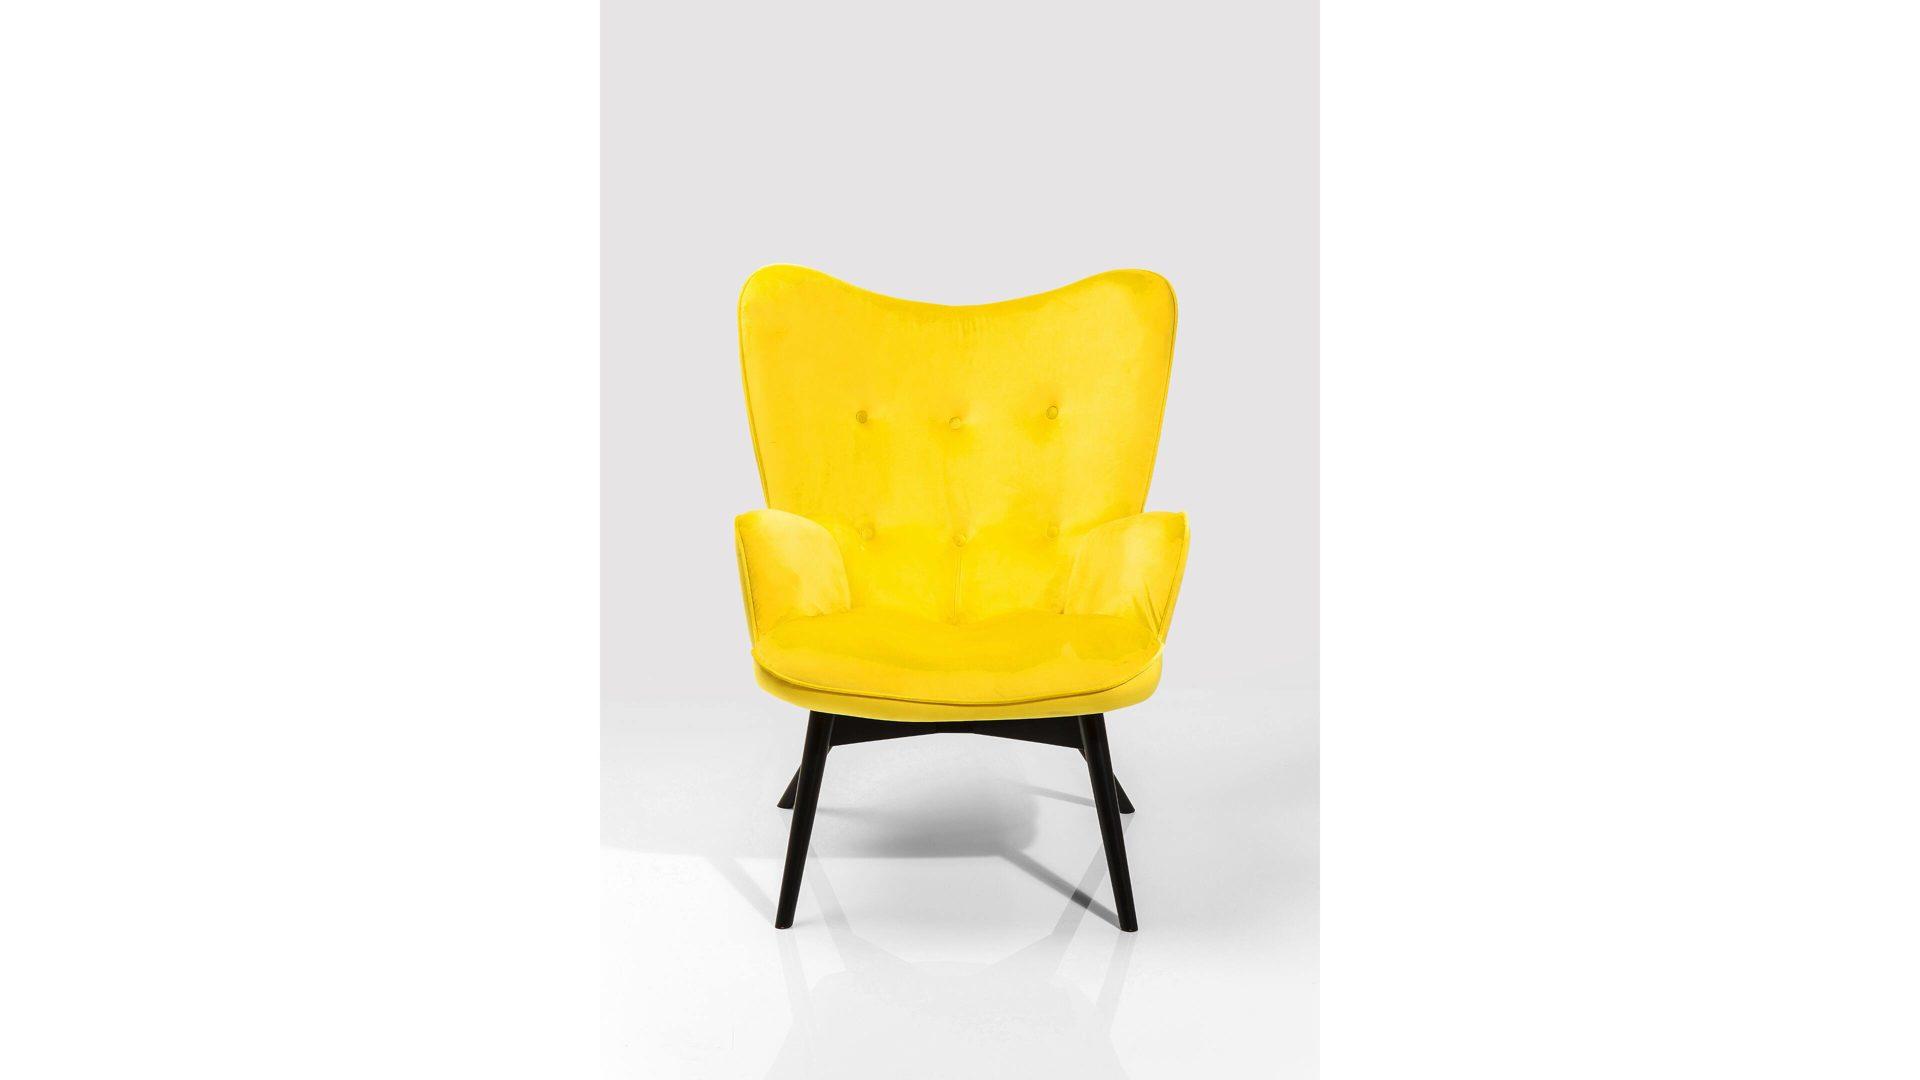 Kare Design Retro Sessel Vicky Bzw Polstermöbel Gelber Samtbezug